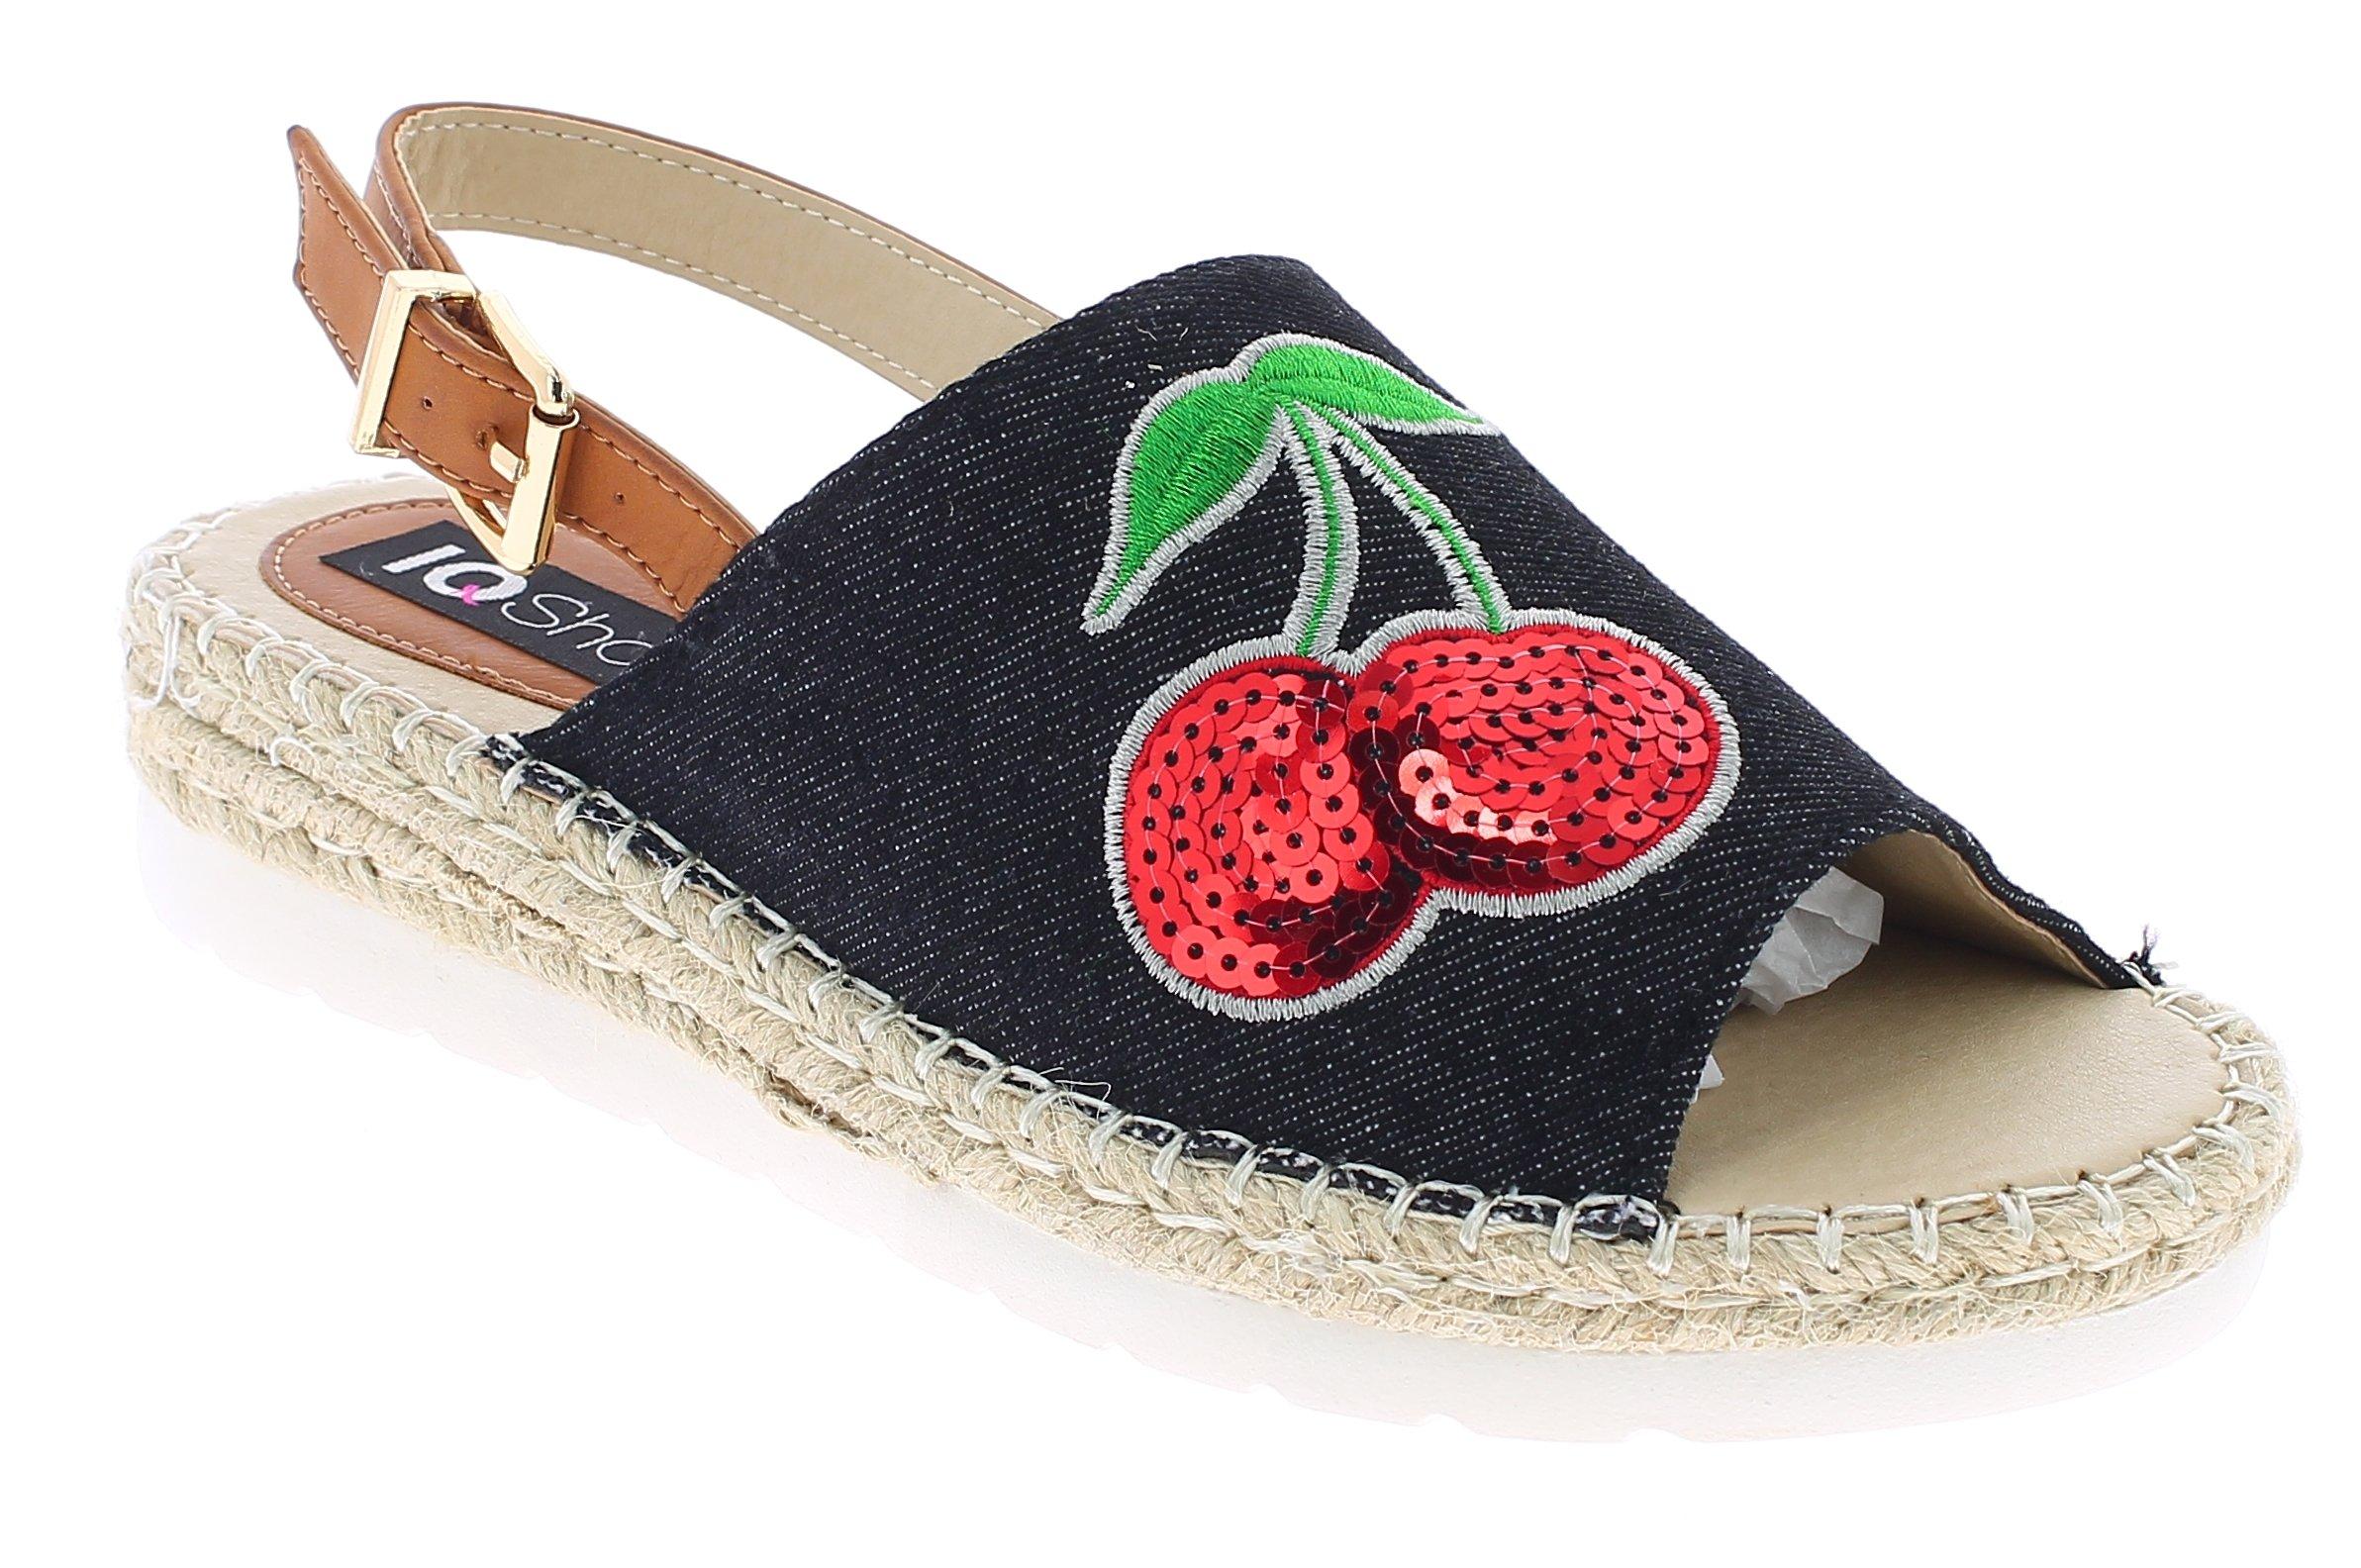 IQSHOES Γυναικείο Πέδιλο 170113 Μαύρο - IqShoes - 1701-13 BLACK-black-36/1/15/7 παπούτσια  γυναικεία σανδάλια   πέδιλα